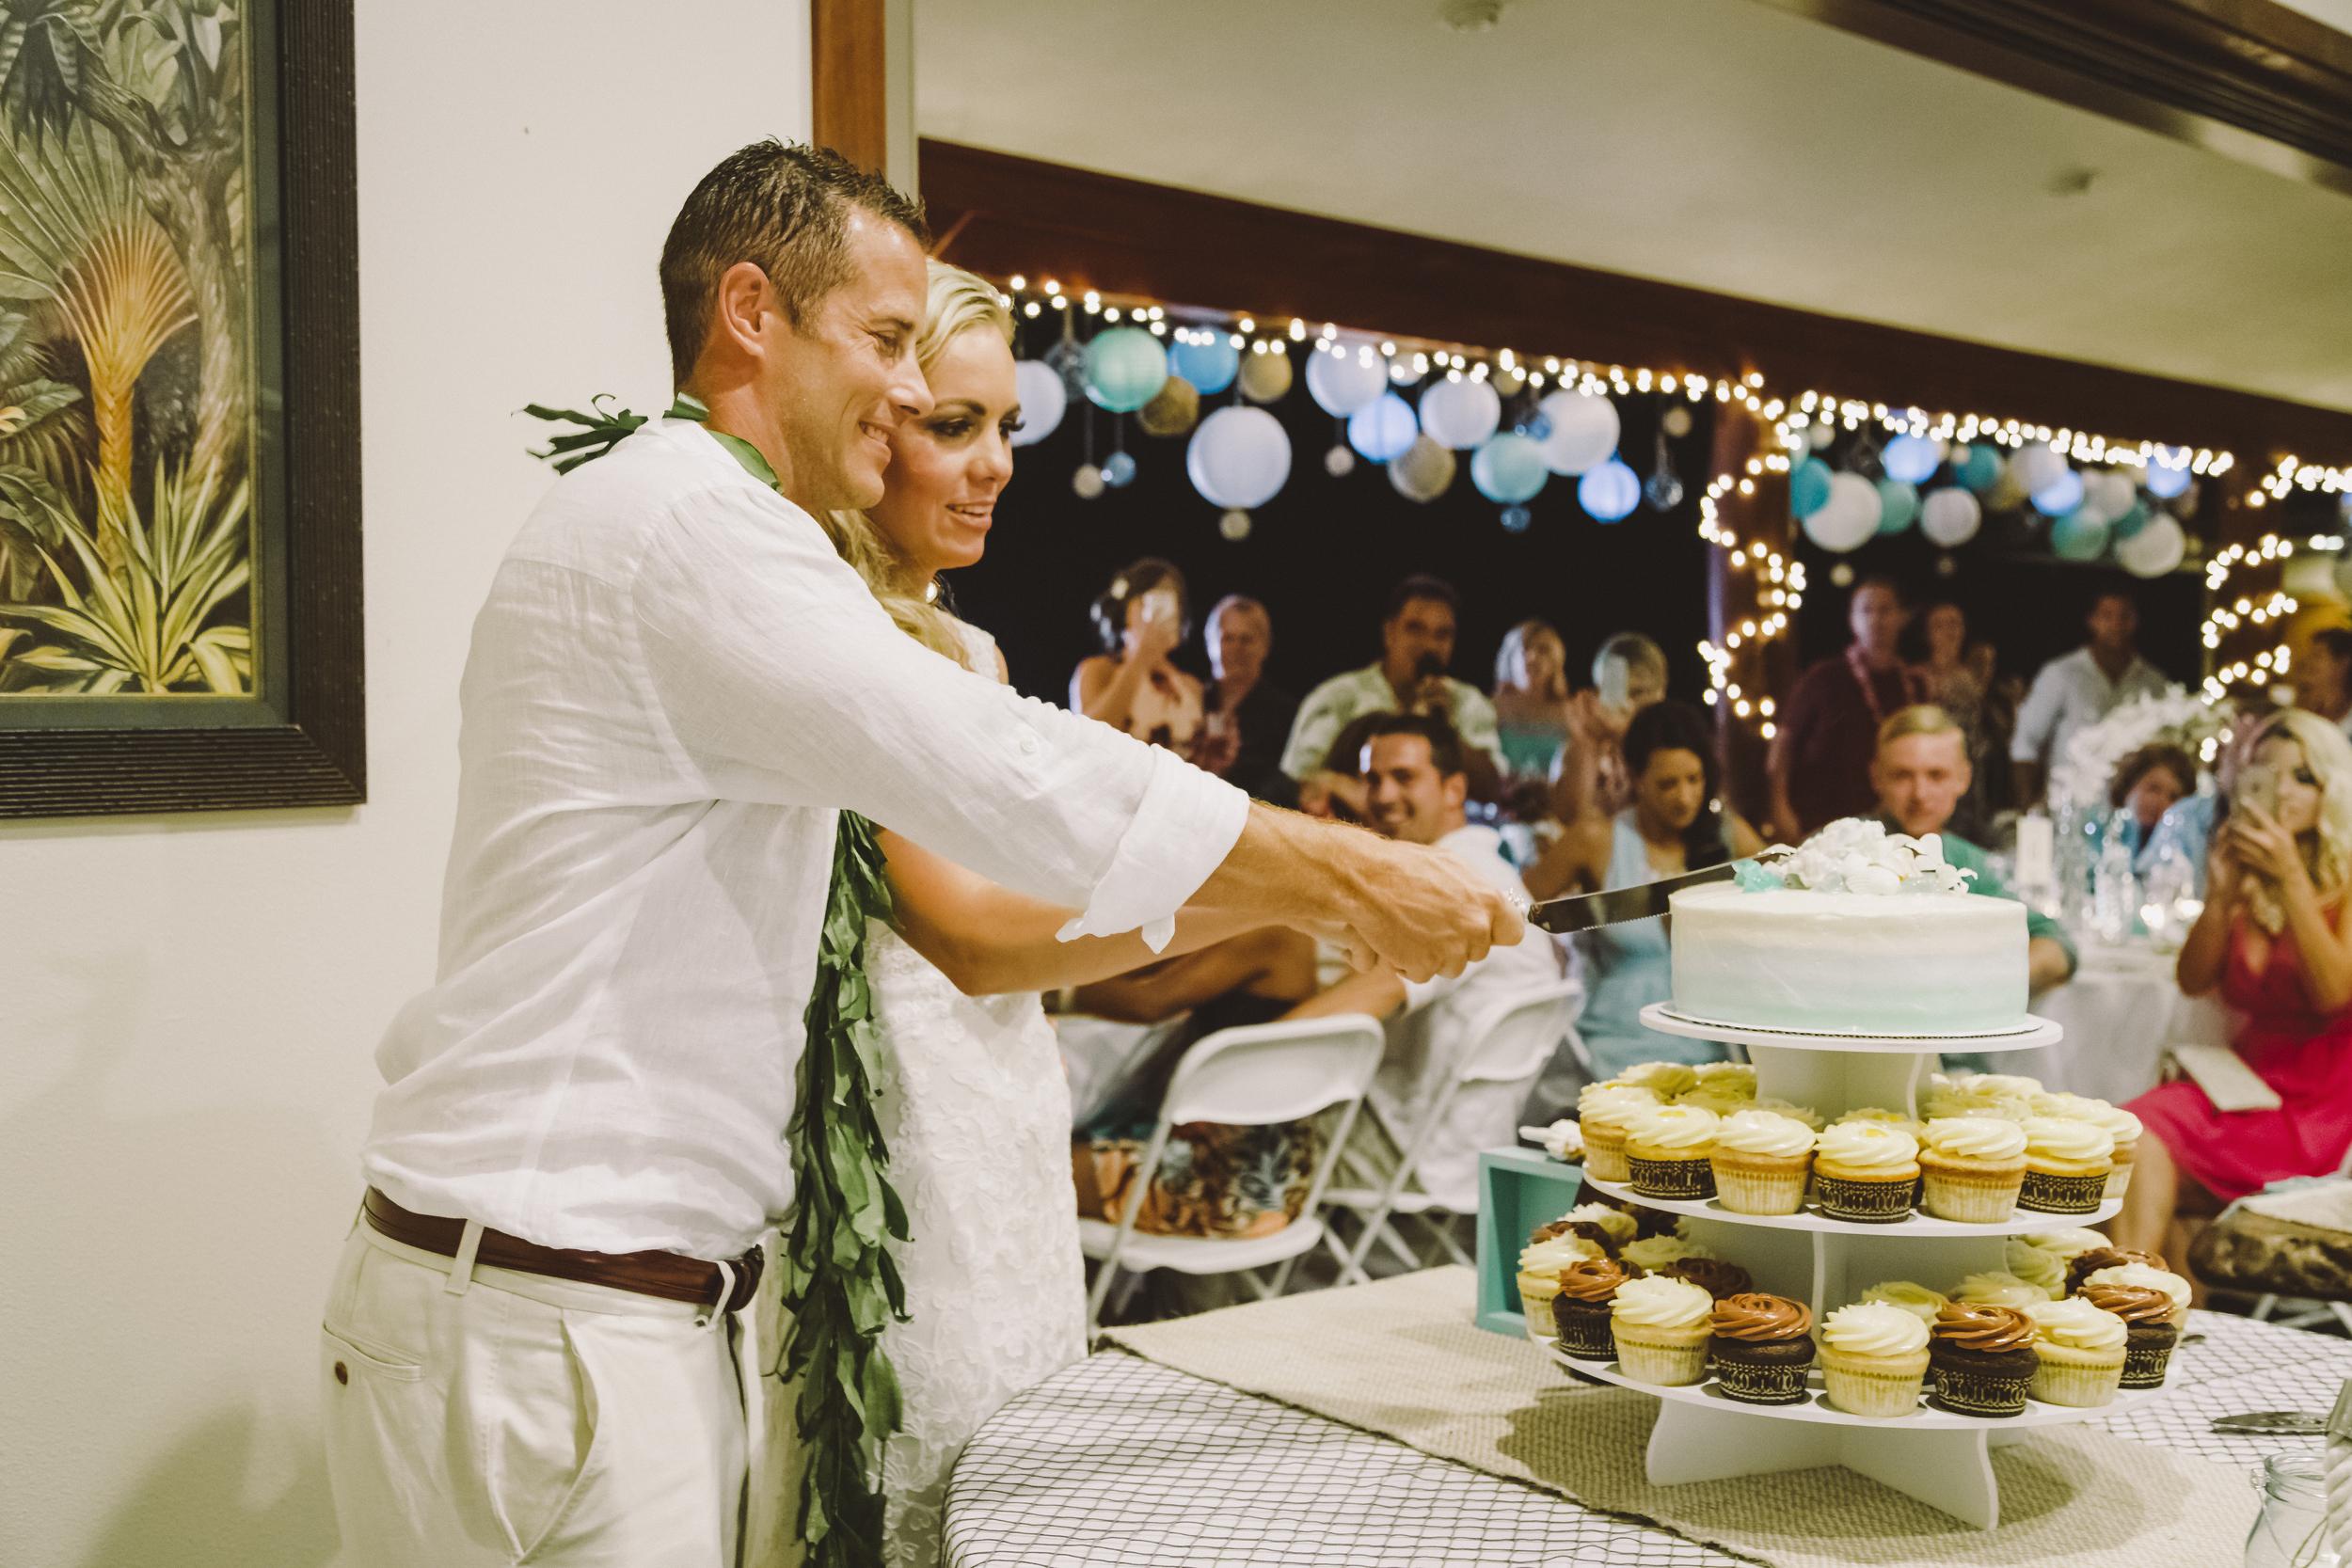 angie-diaz-photography-hawaii-wedding-photographer-kelli-jay-129.jpg